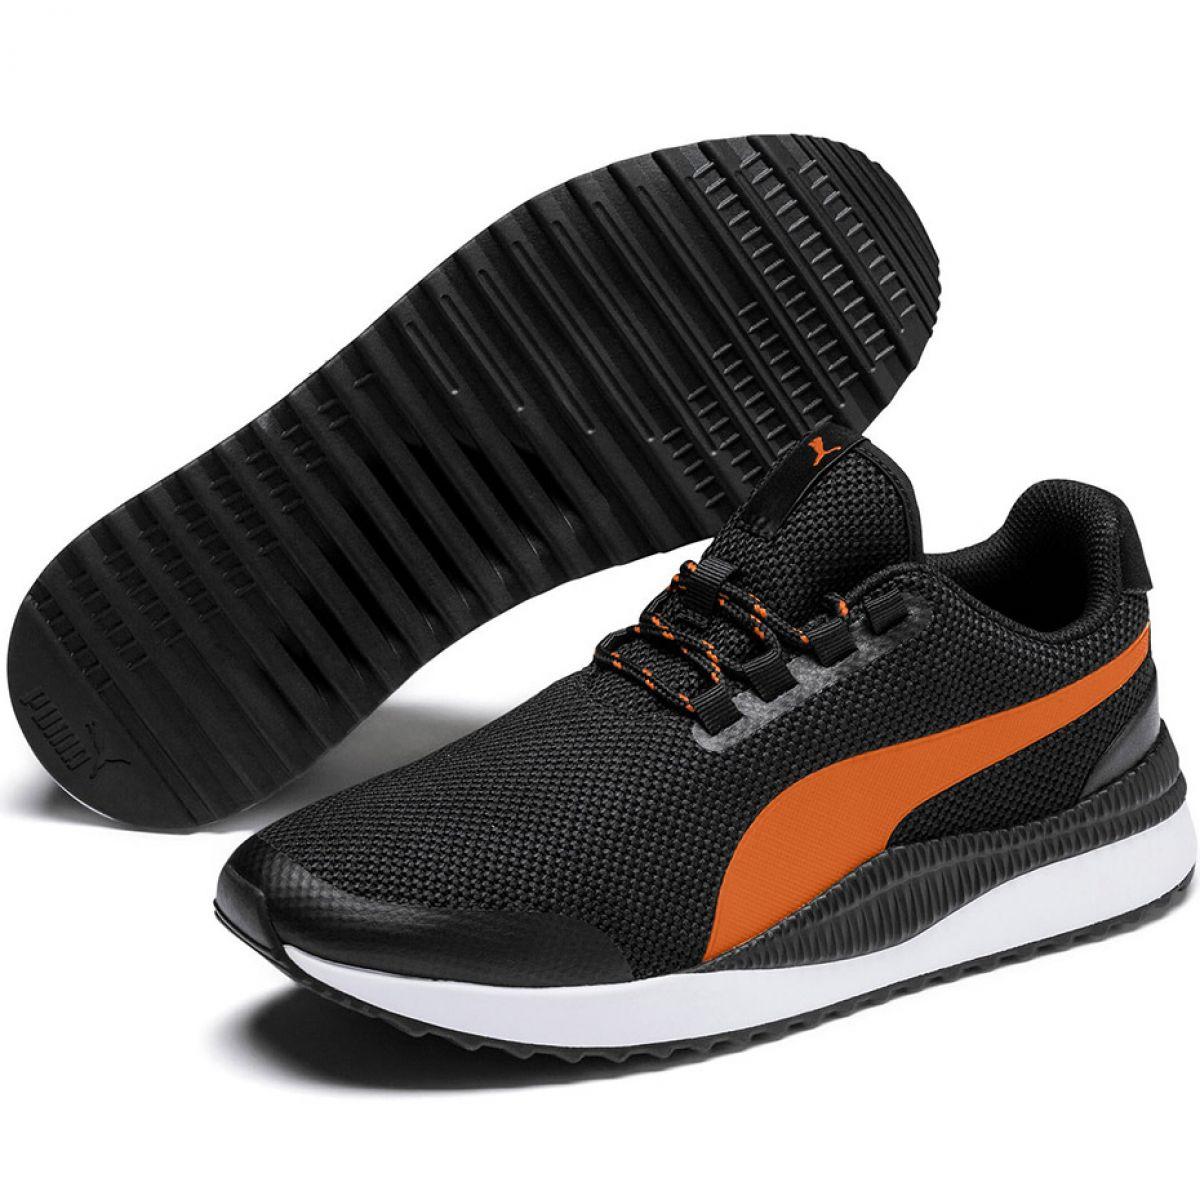 Puma Pacer Next FS Knit 2.0